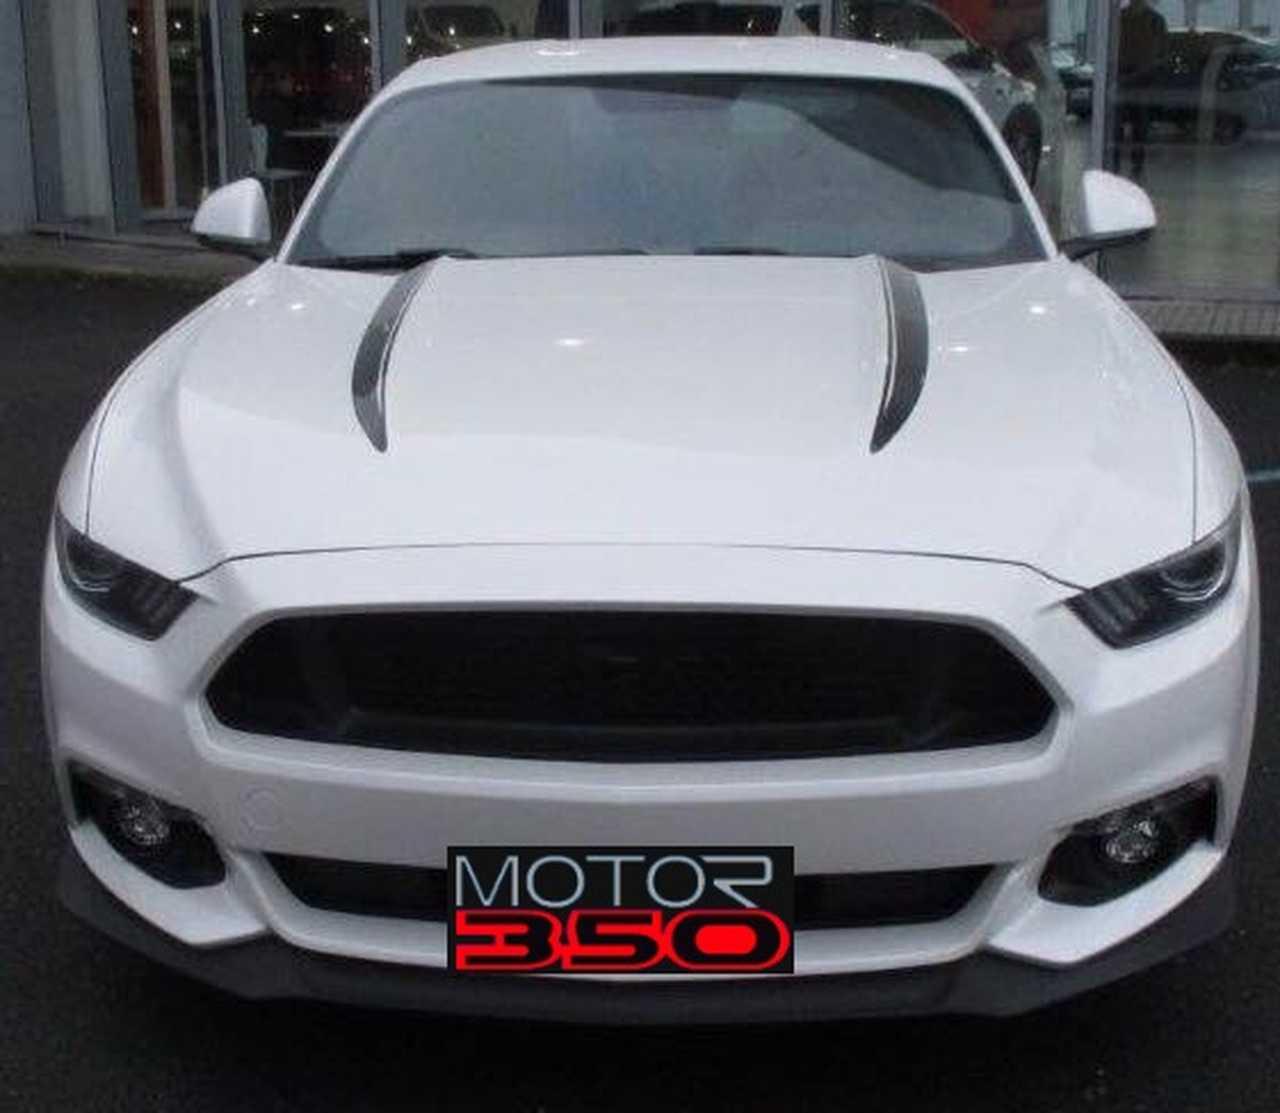 Ford Mustang 5.0 TI-VCT V8   - Foto 1